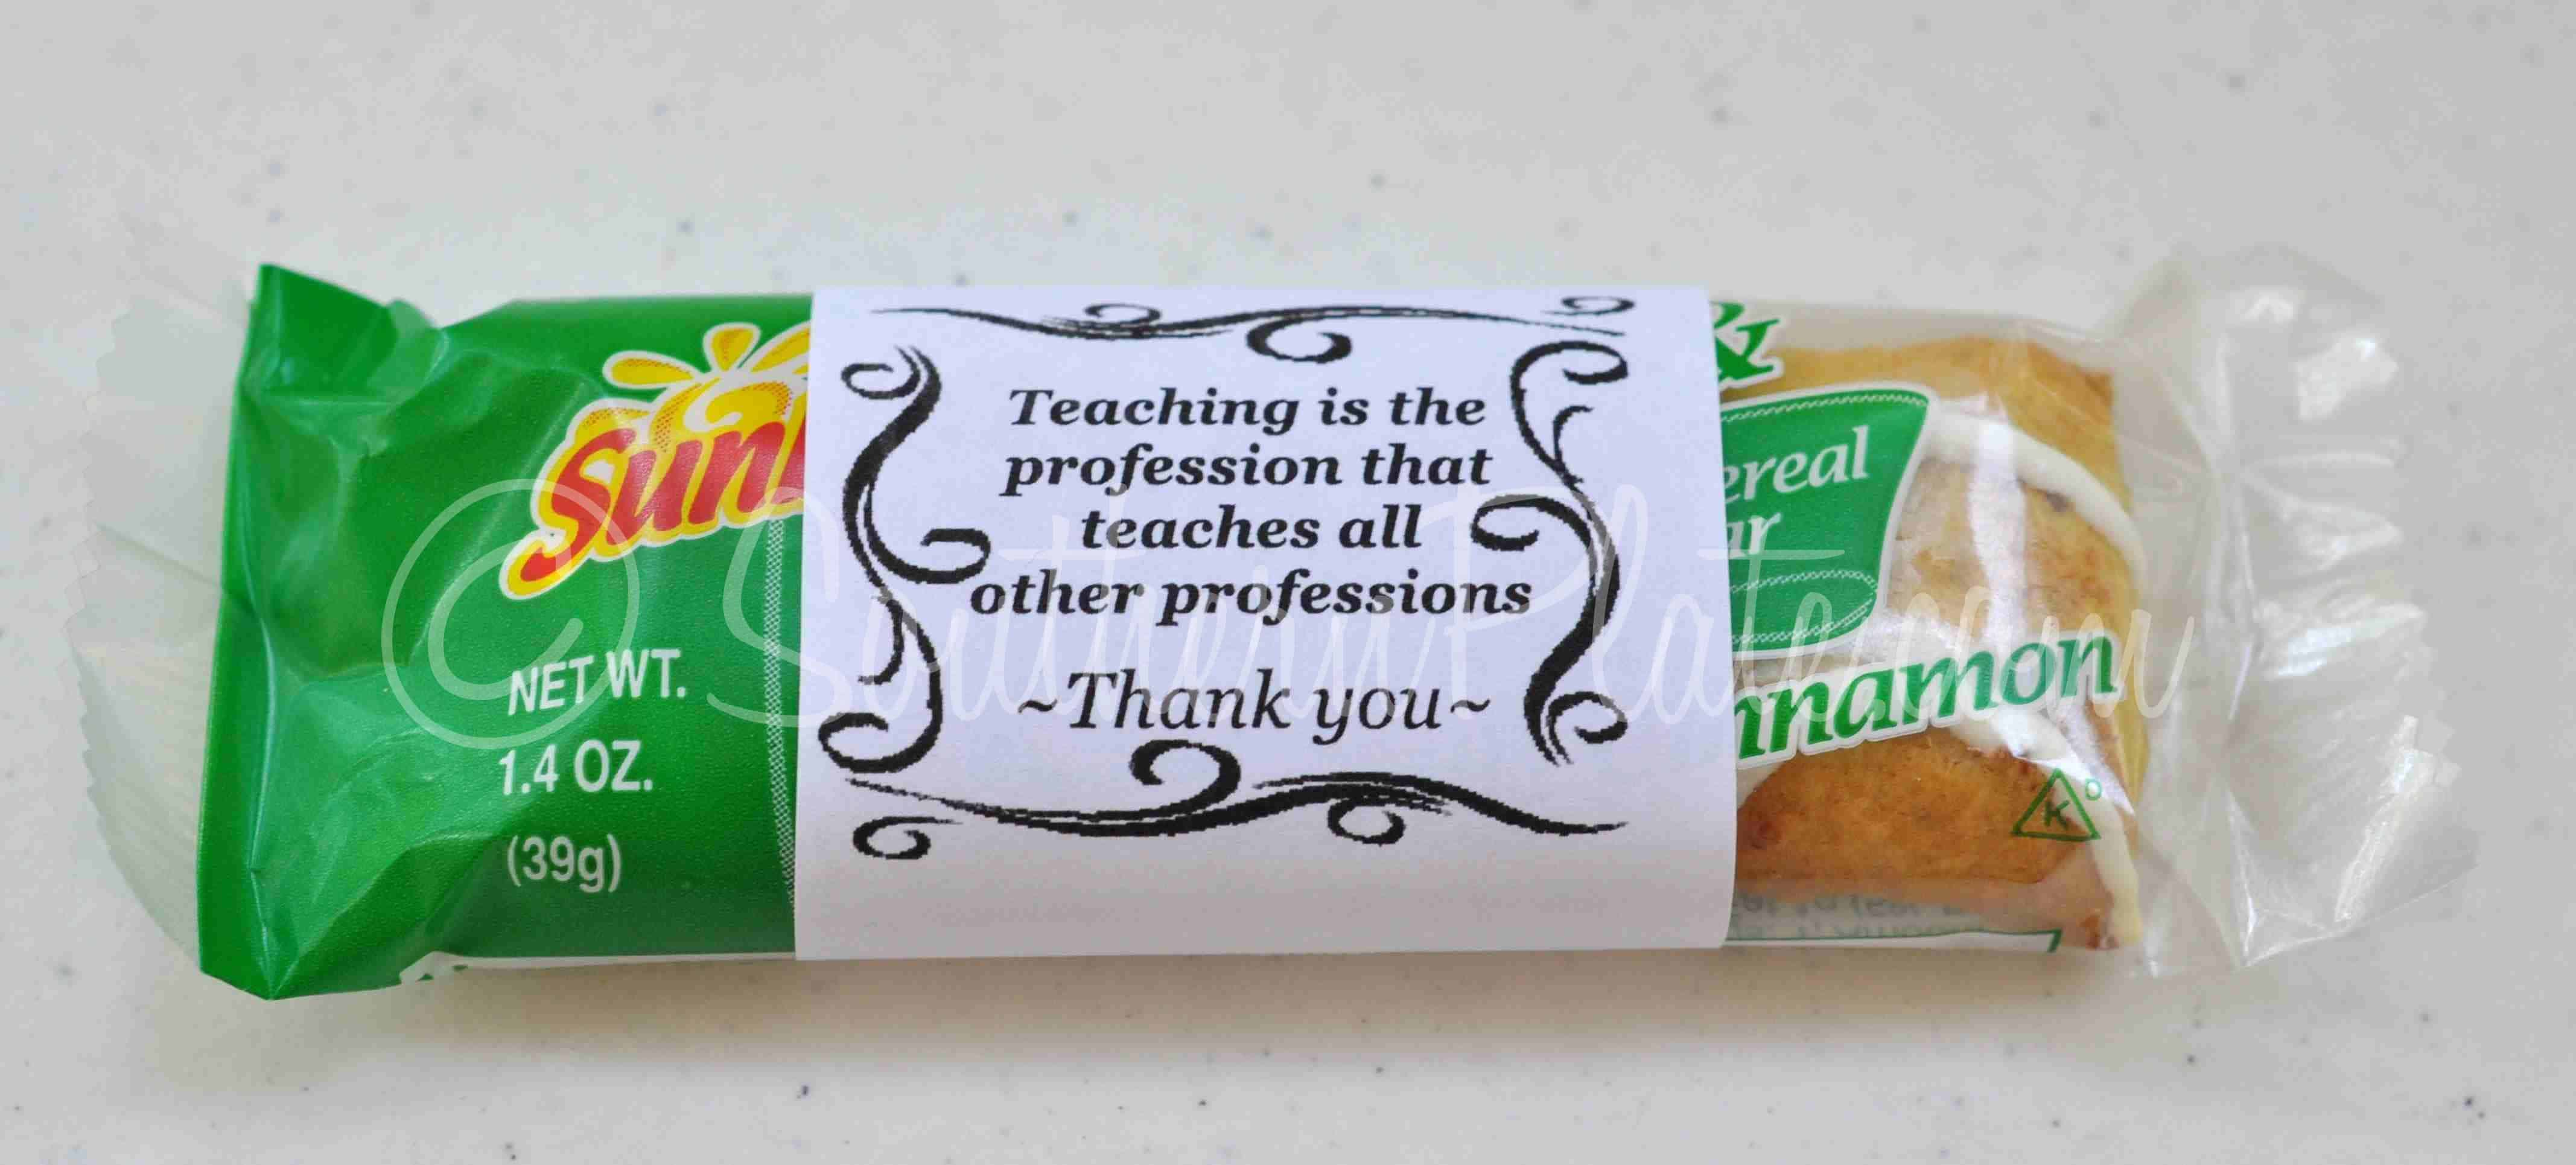 DIY Appreciation Gifts for School, Work, or Friends ...